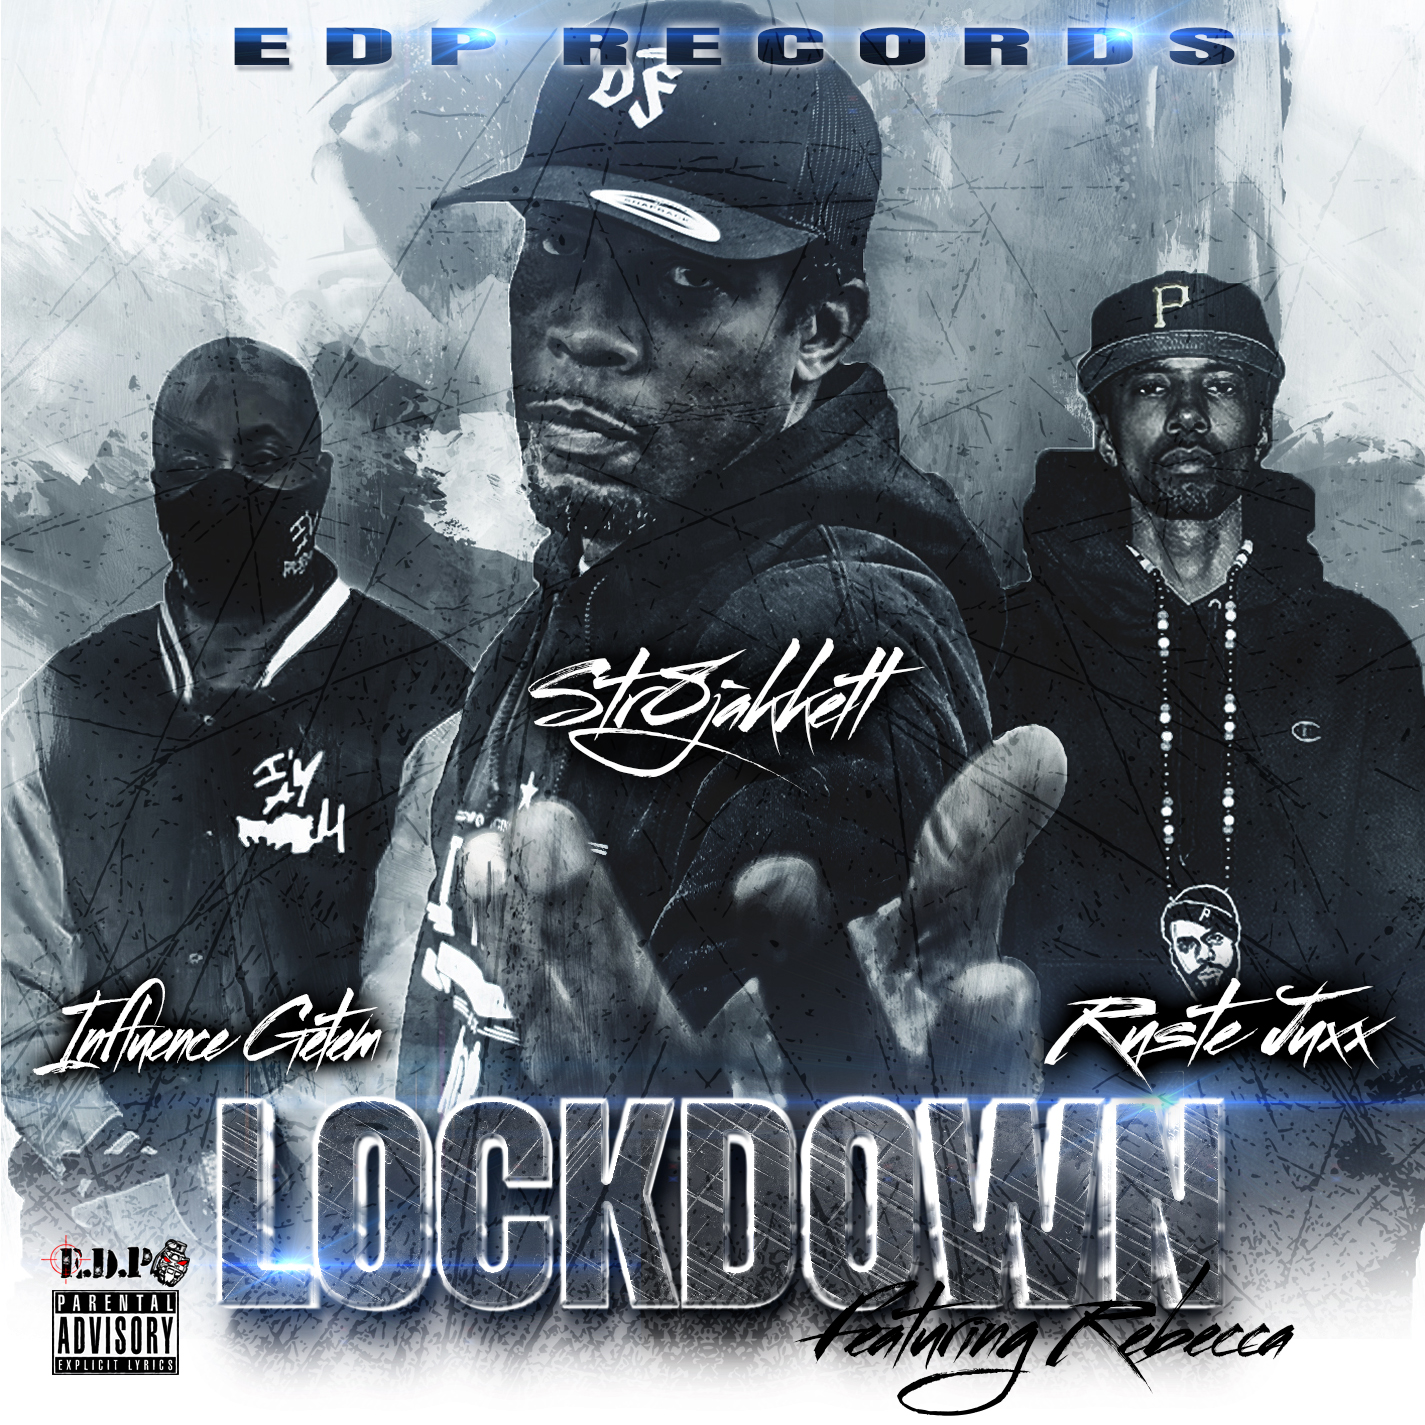 Lockdown (single)